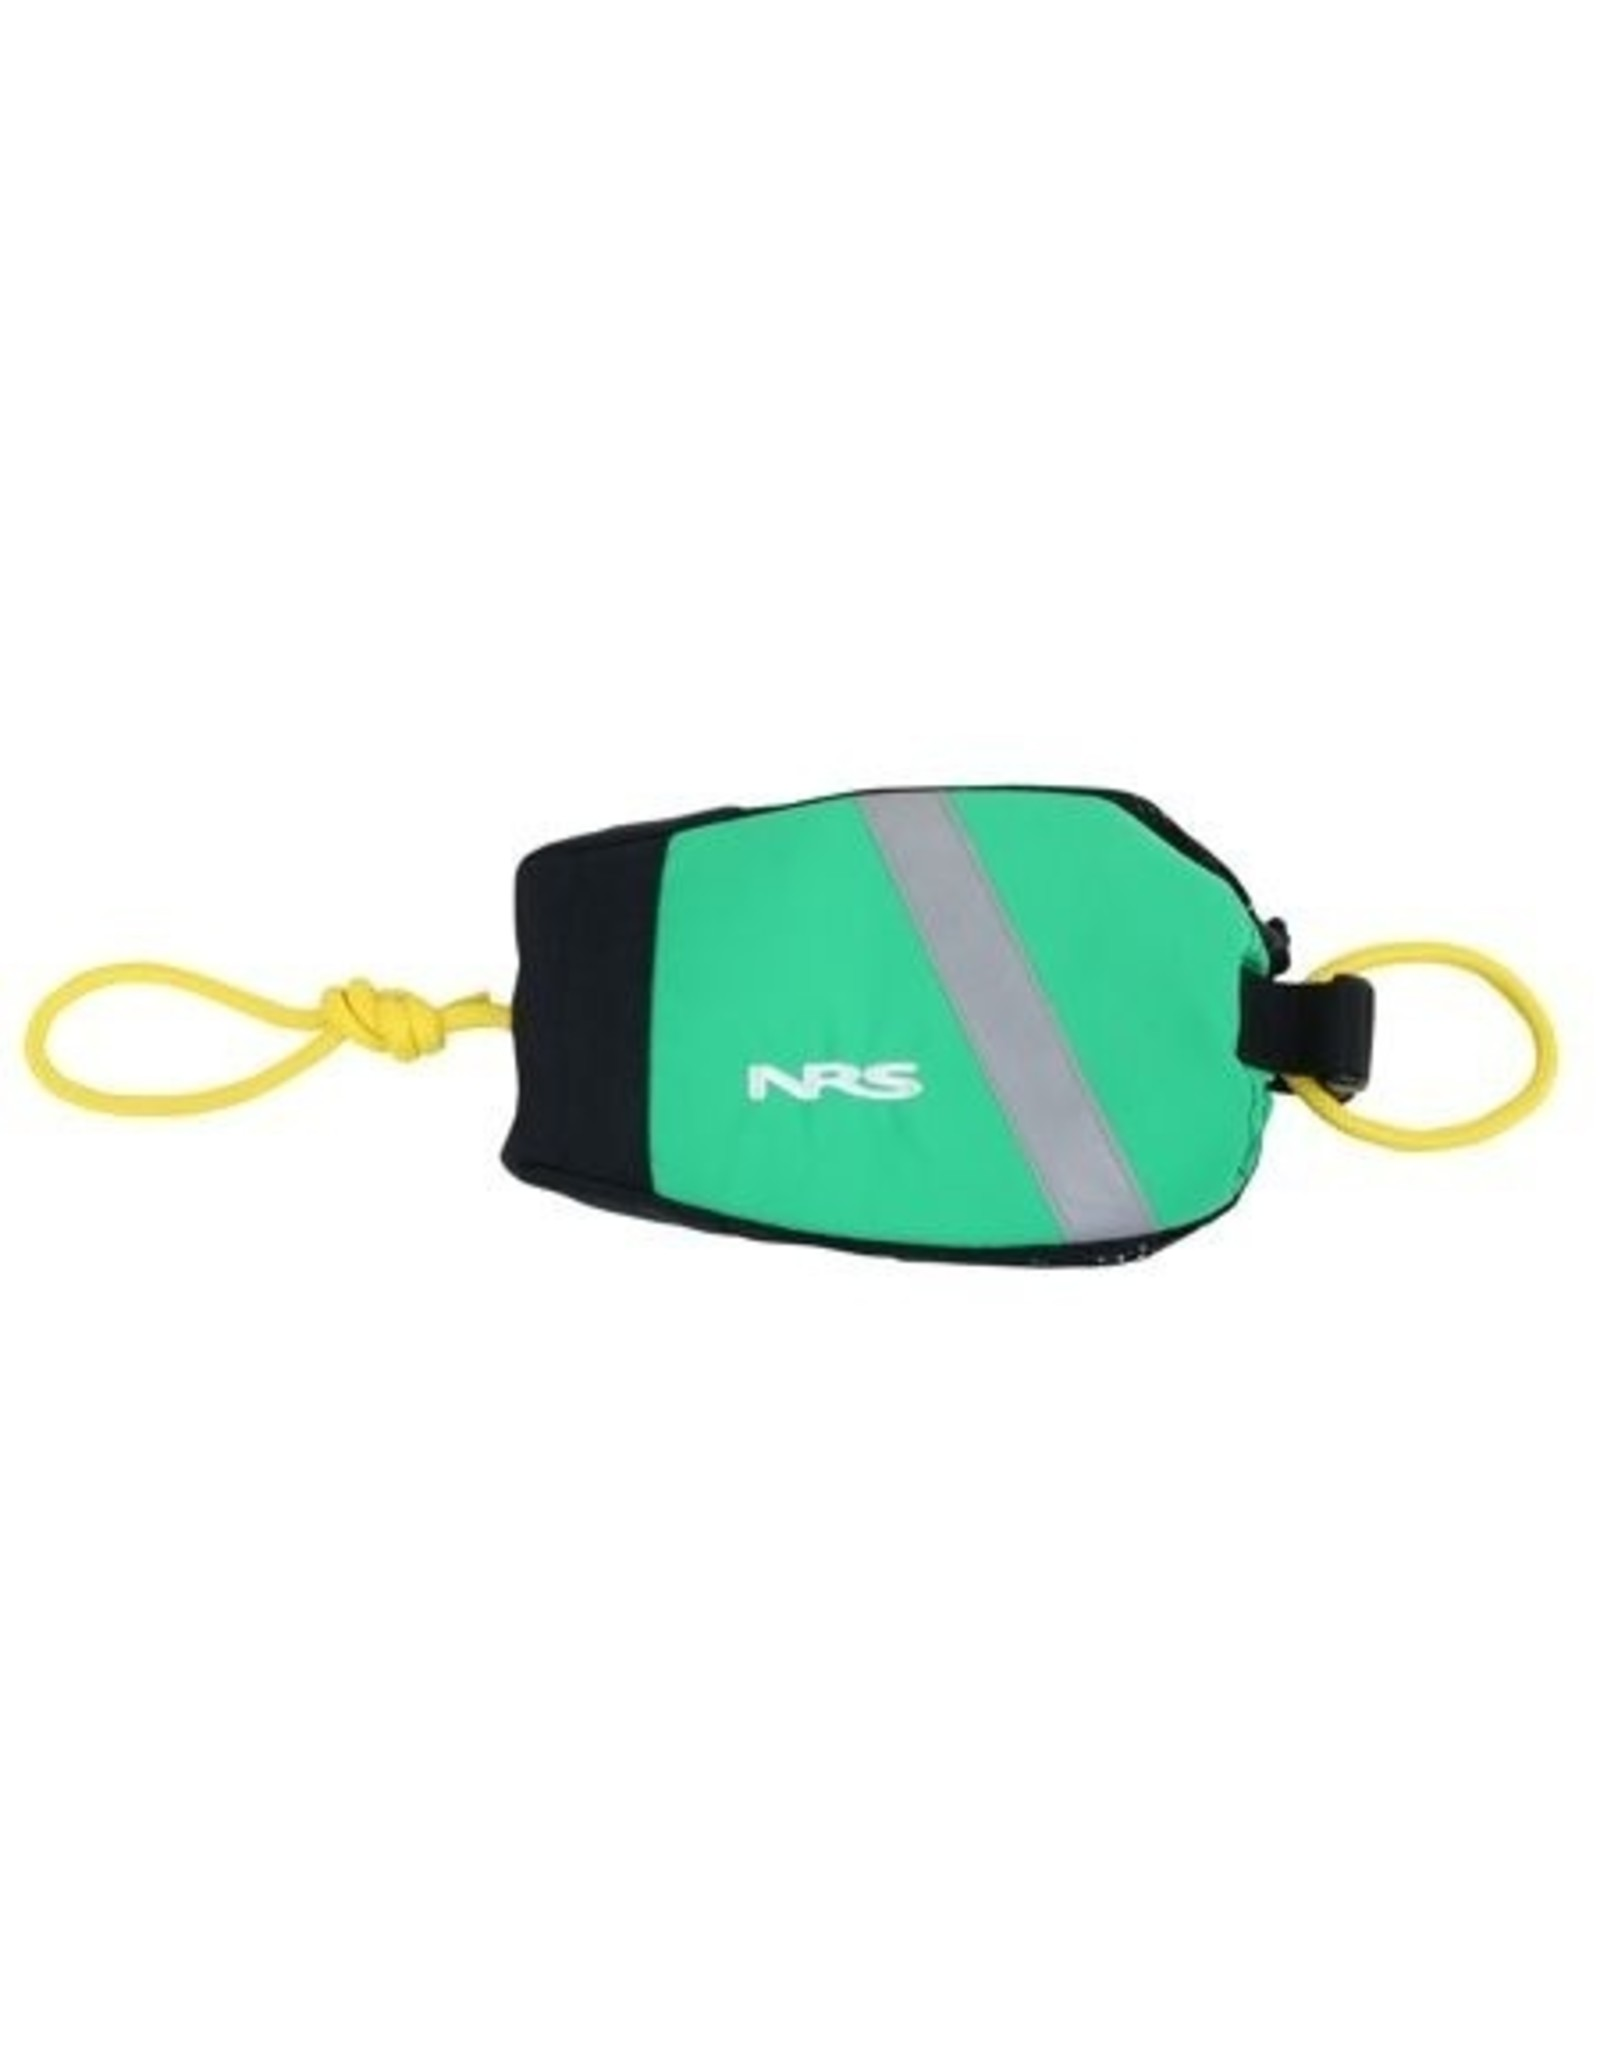 NRS NRS Wedge Throw Bag 55' Green